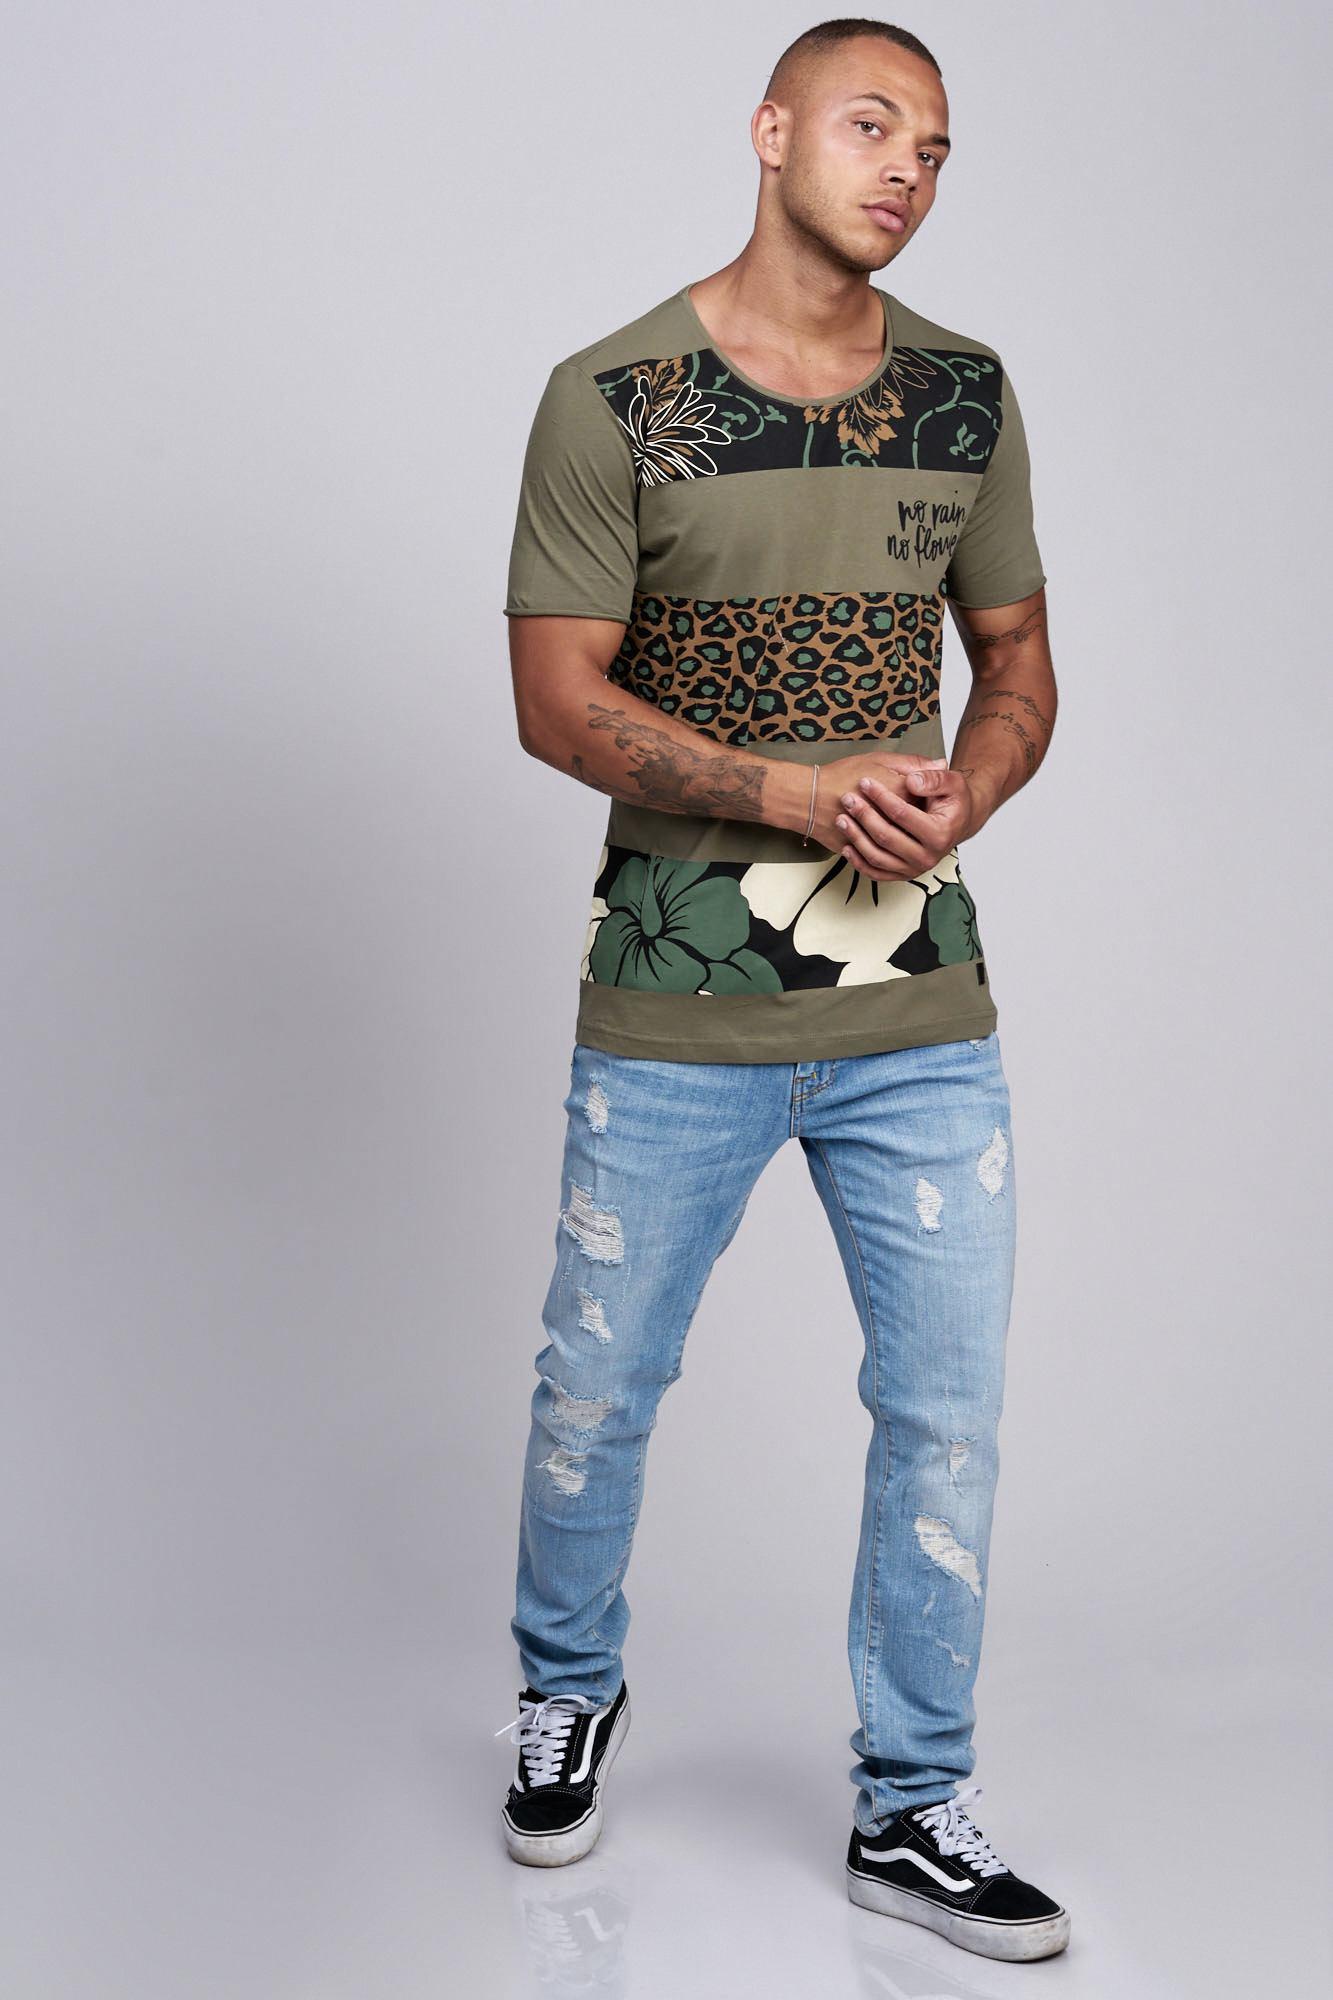 T-shirt-da-Uomo-Polo-Shirt-a-Maniche-Corte-printshirt-Polo-a-Maniche-Corte-17019-John-Kayna miniatura 6